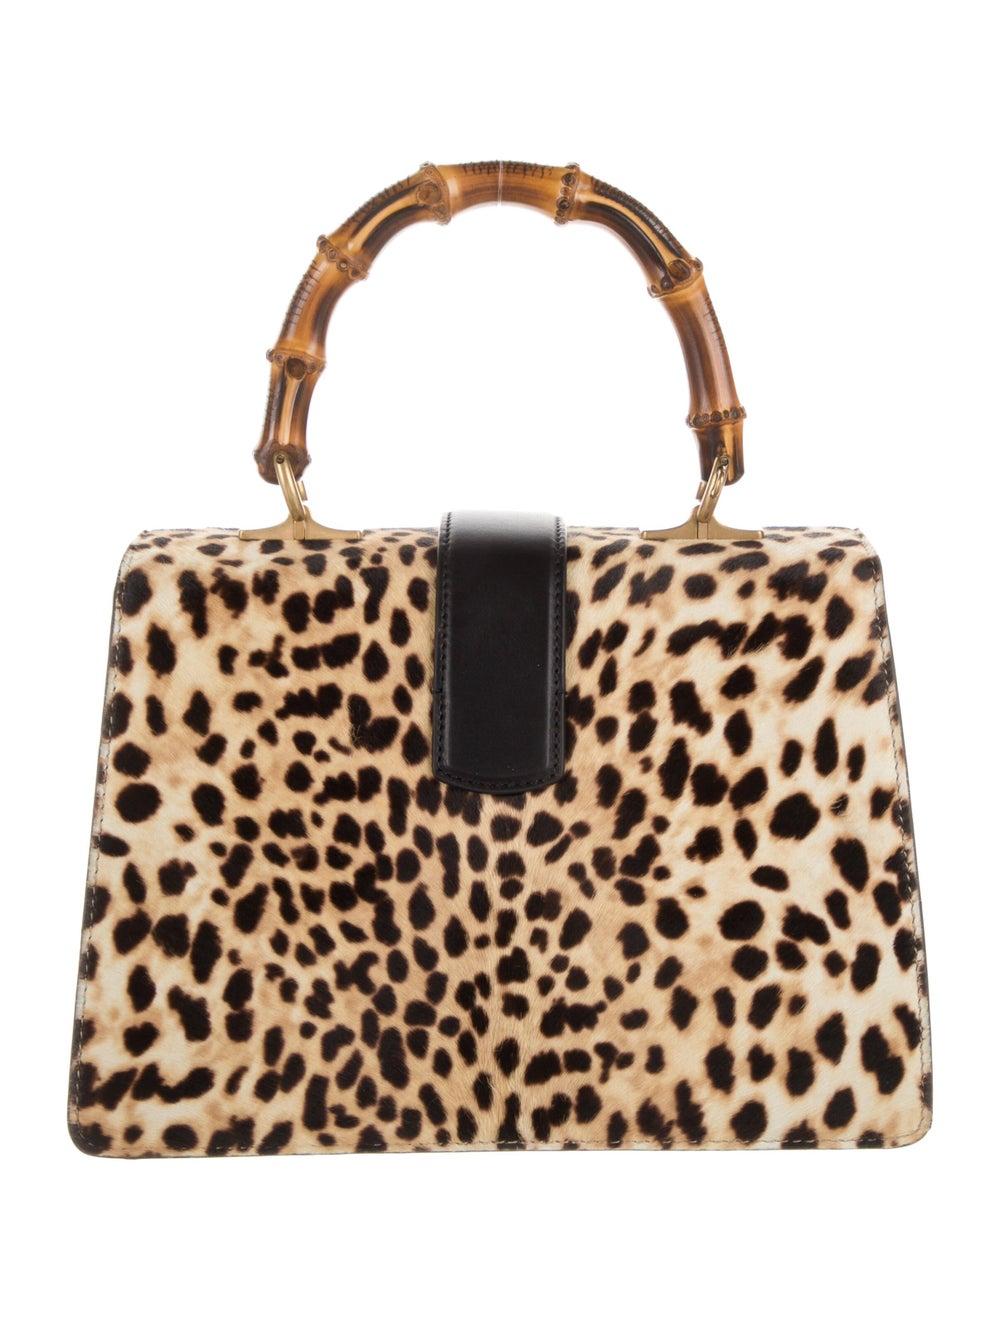 Gucci Dionysus Bamboo Top Handle Bag Gold - image 4